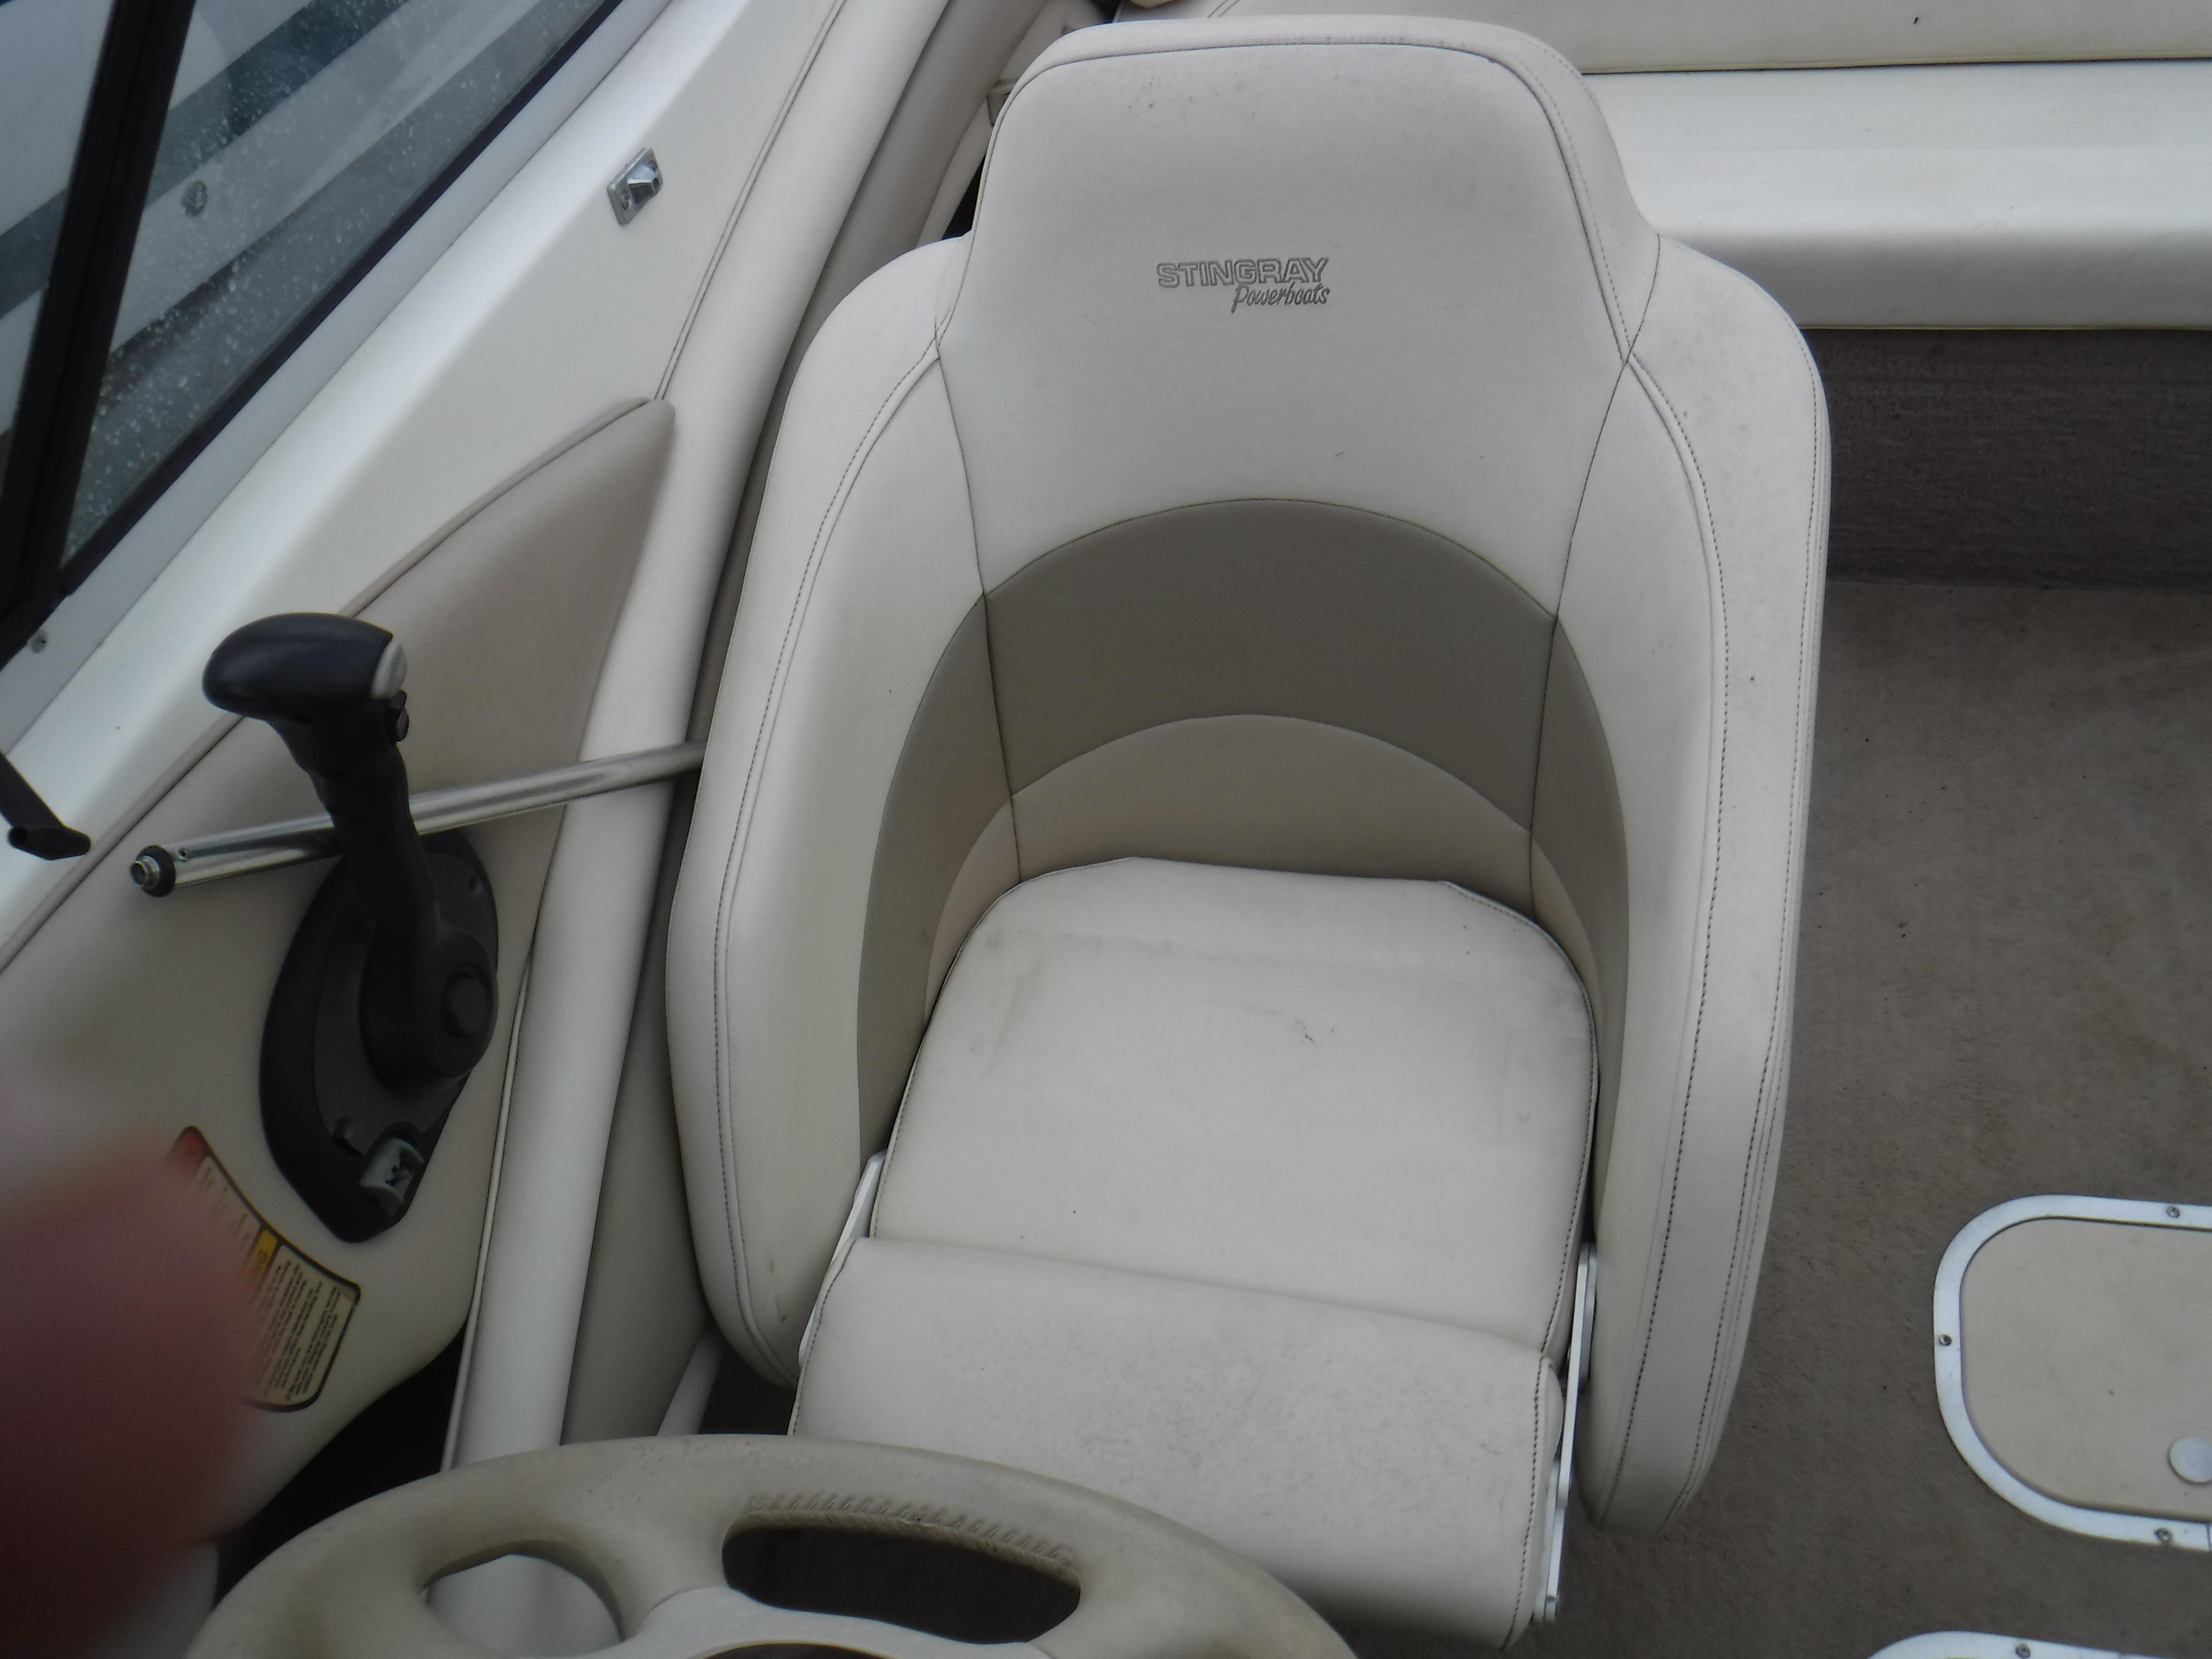 2001 Stingray 220 Lx 171 Carolina Boat Amp Trailer Denver